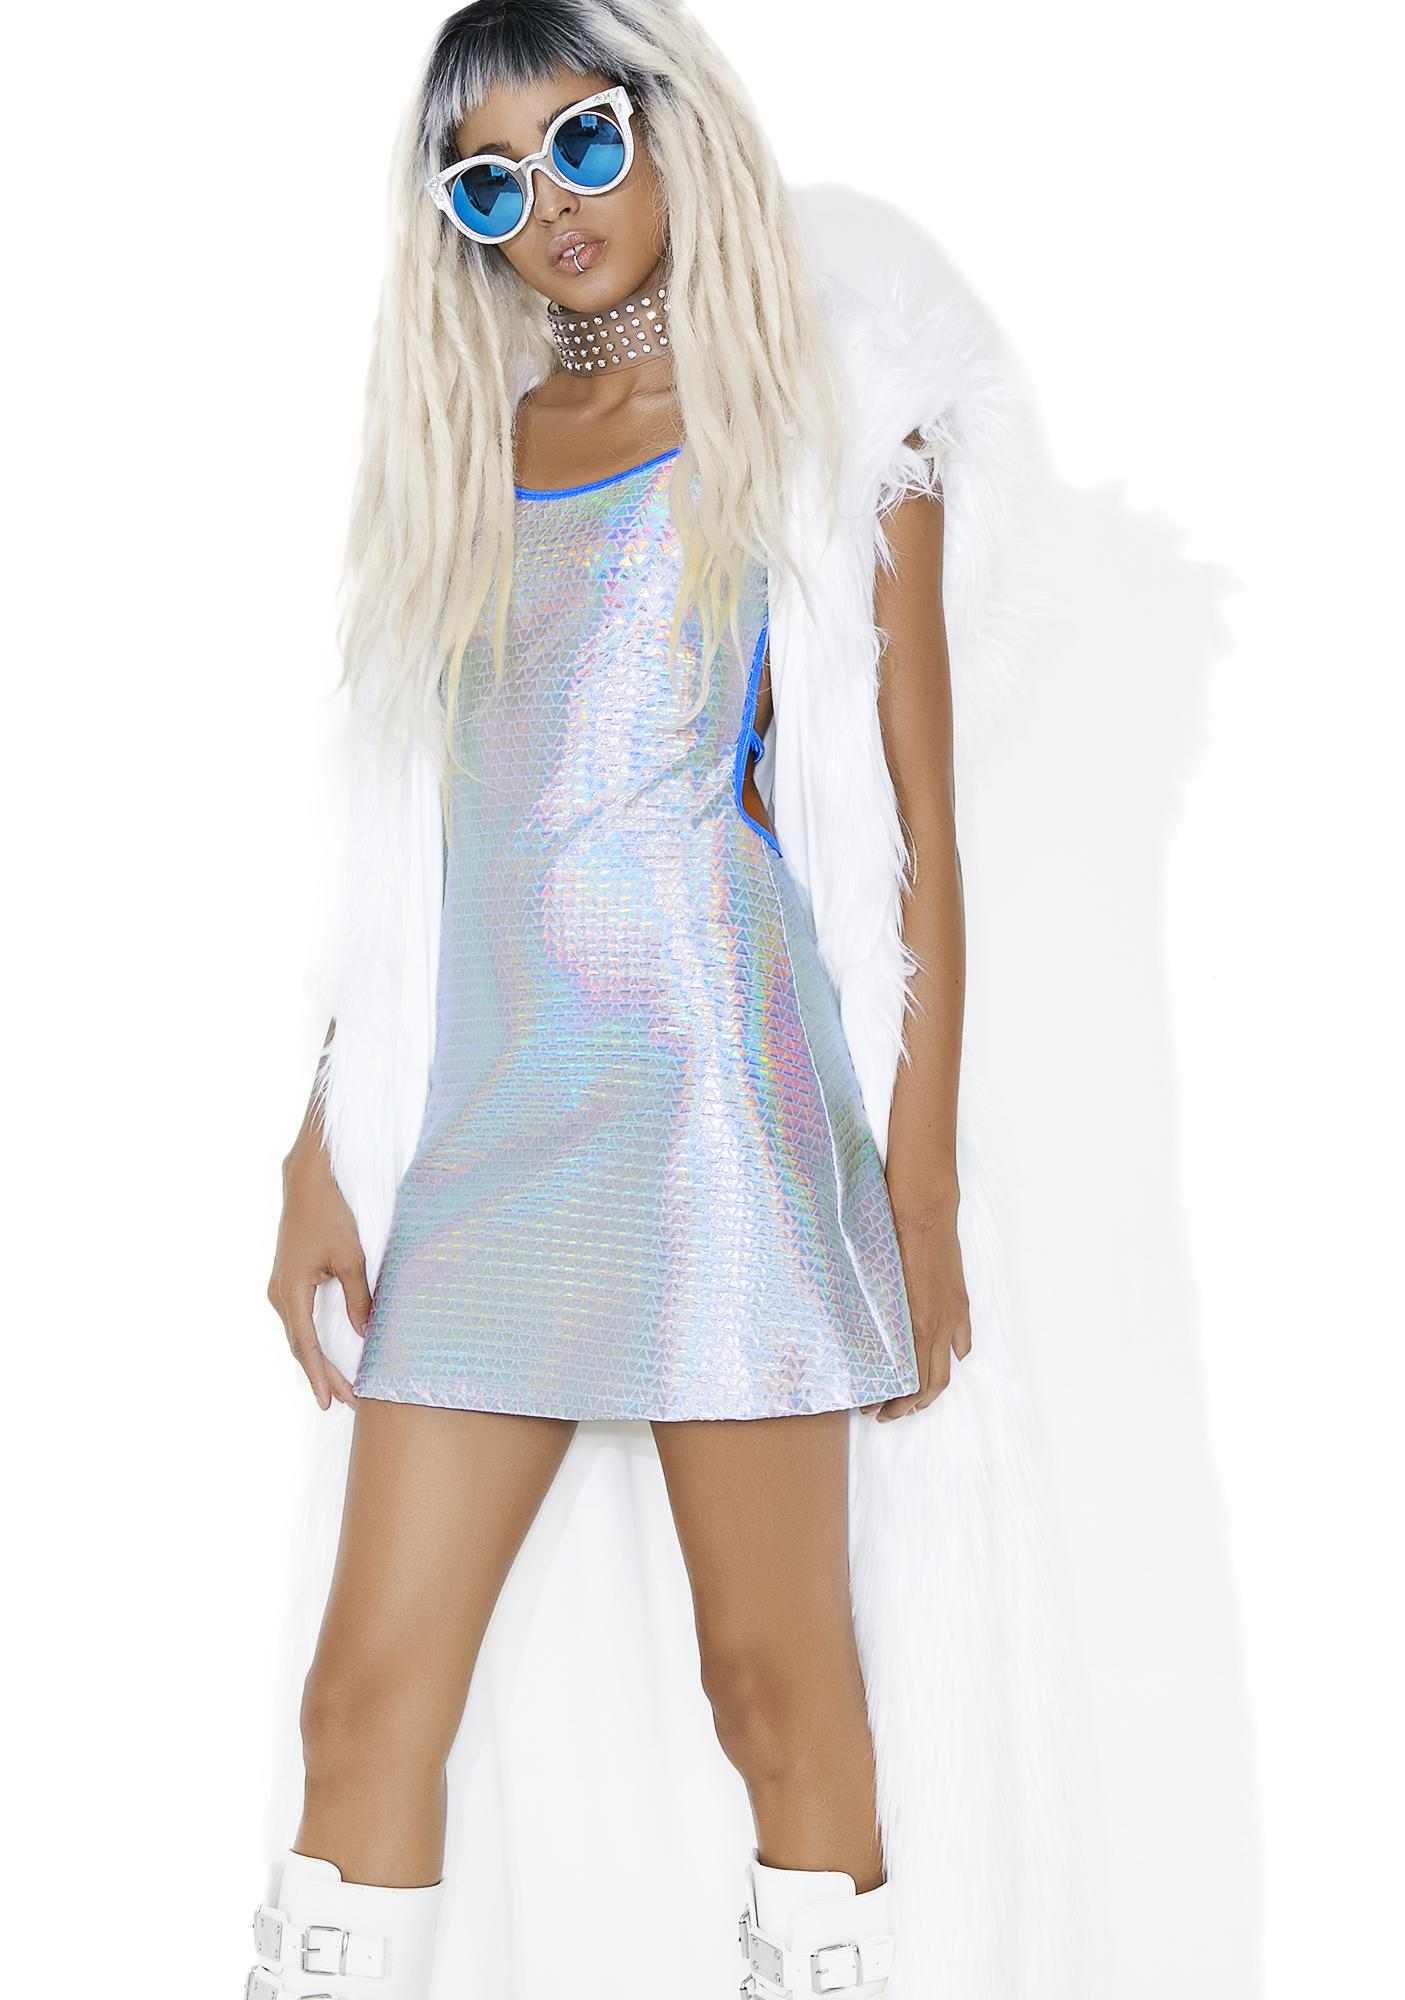 Club Exx Electrick Altar Mini Dress